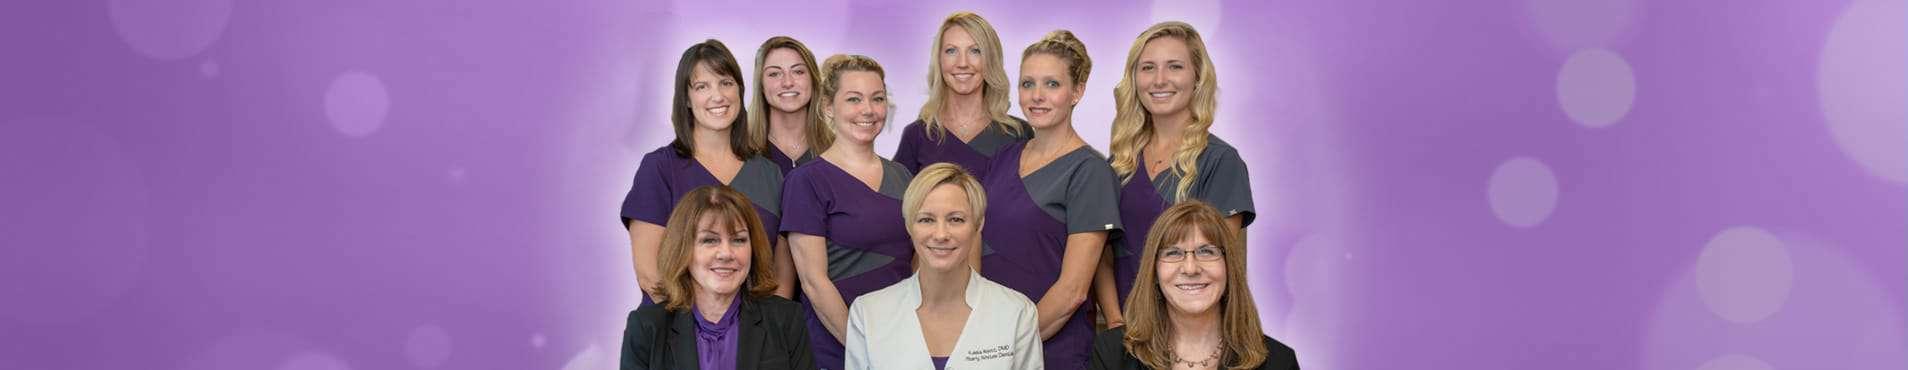 Dental Crowns Dentist Serving Hopewell